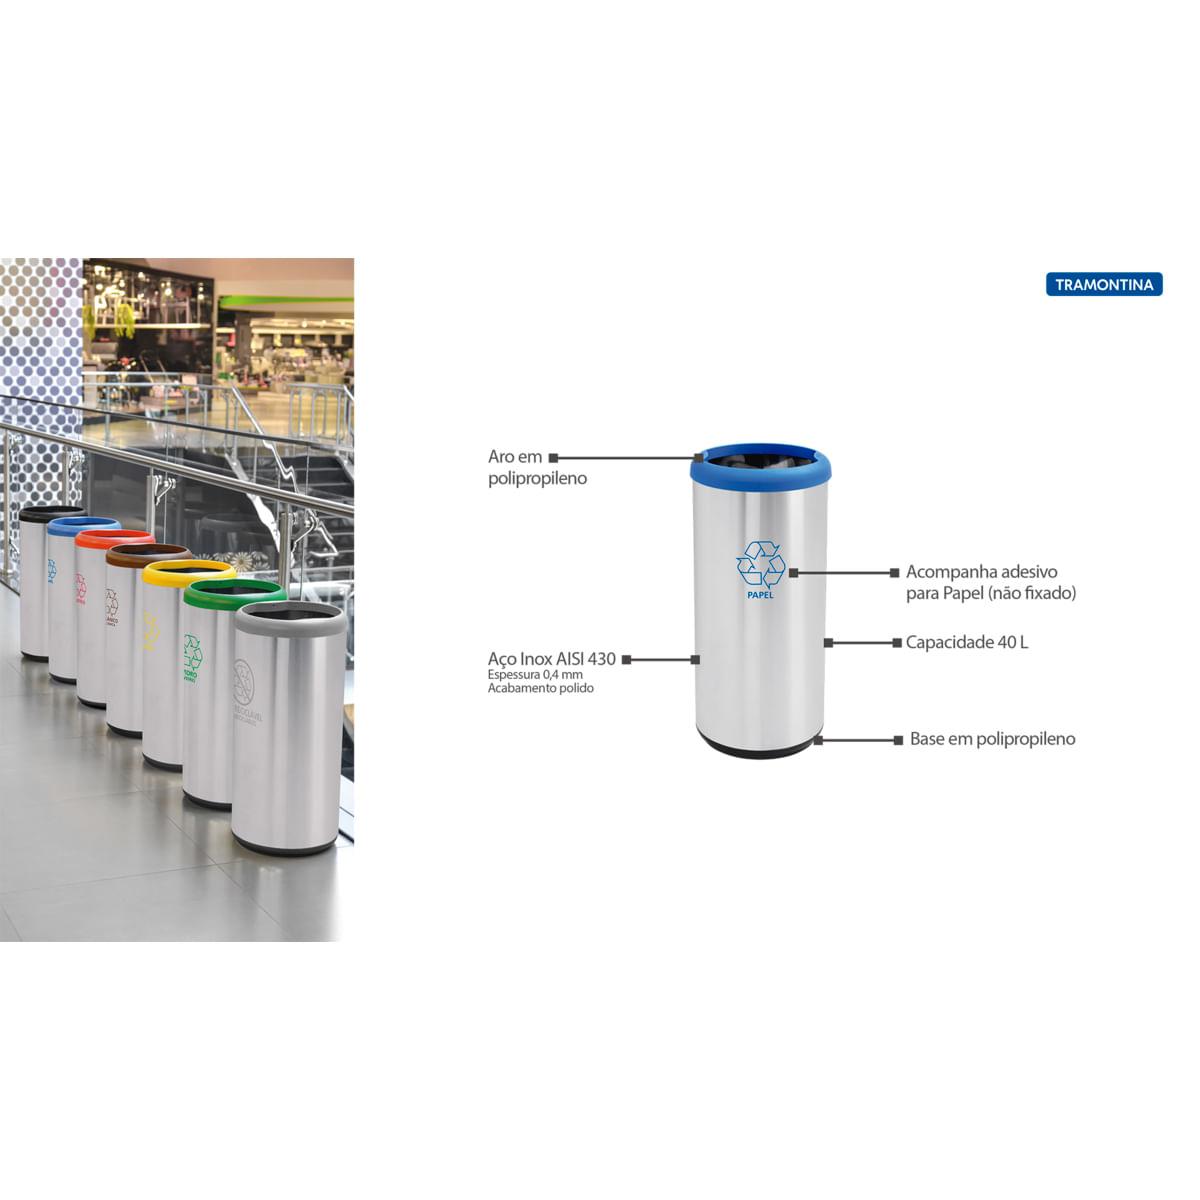 Lixeira Inox Tramontina 40 Litros Cápsula Selecta Plus Azul